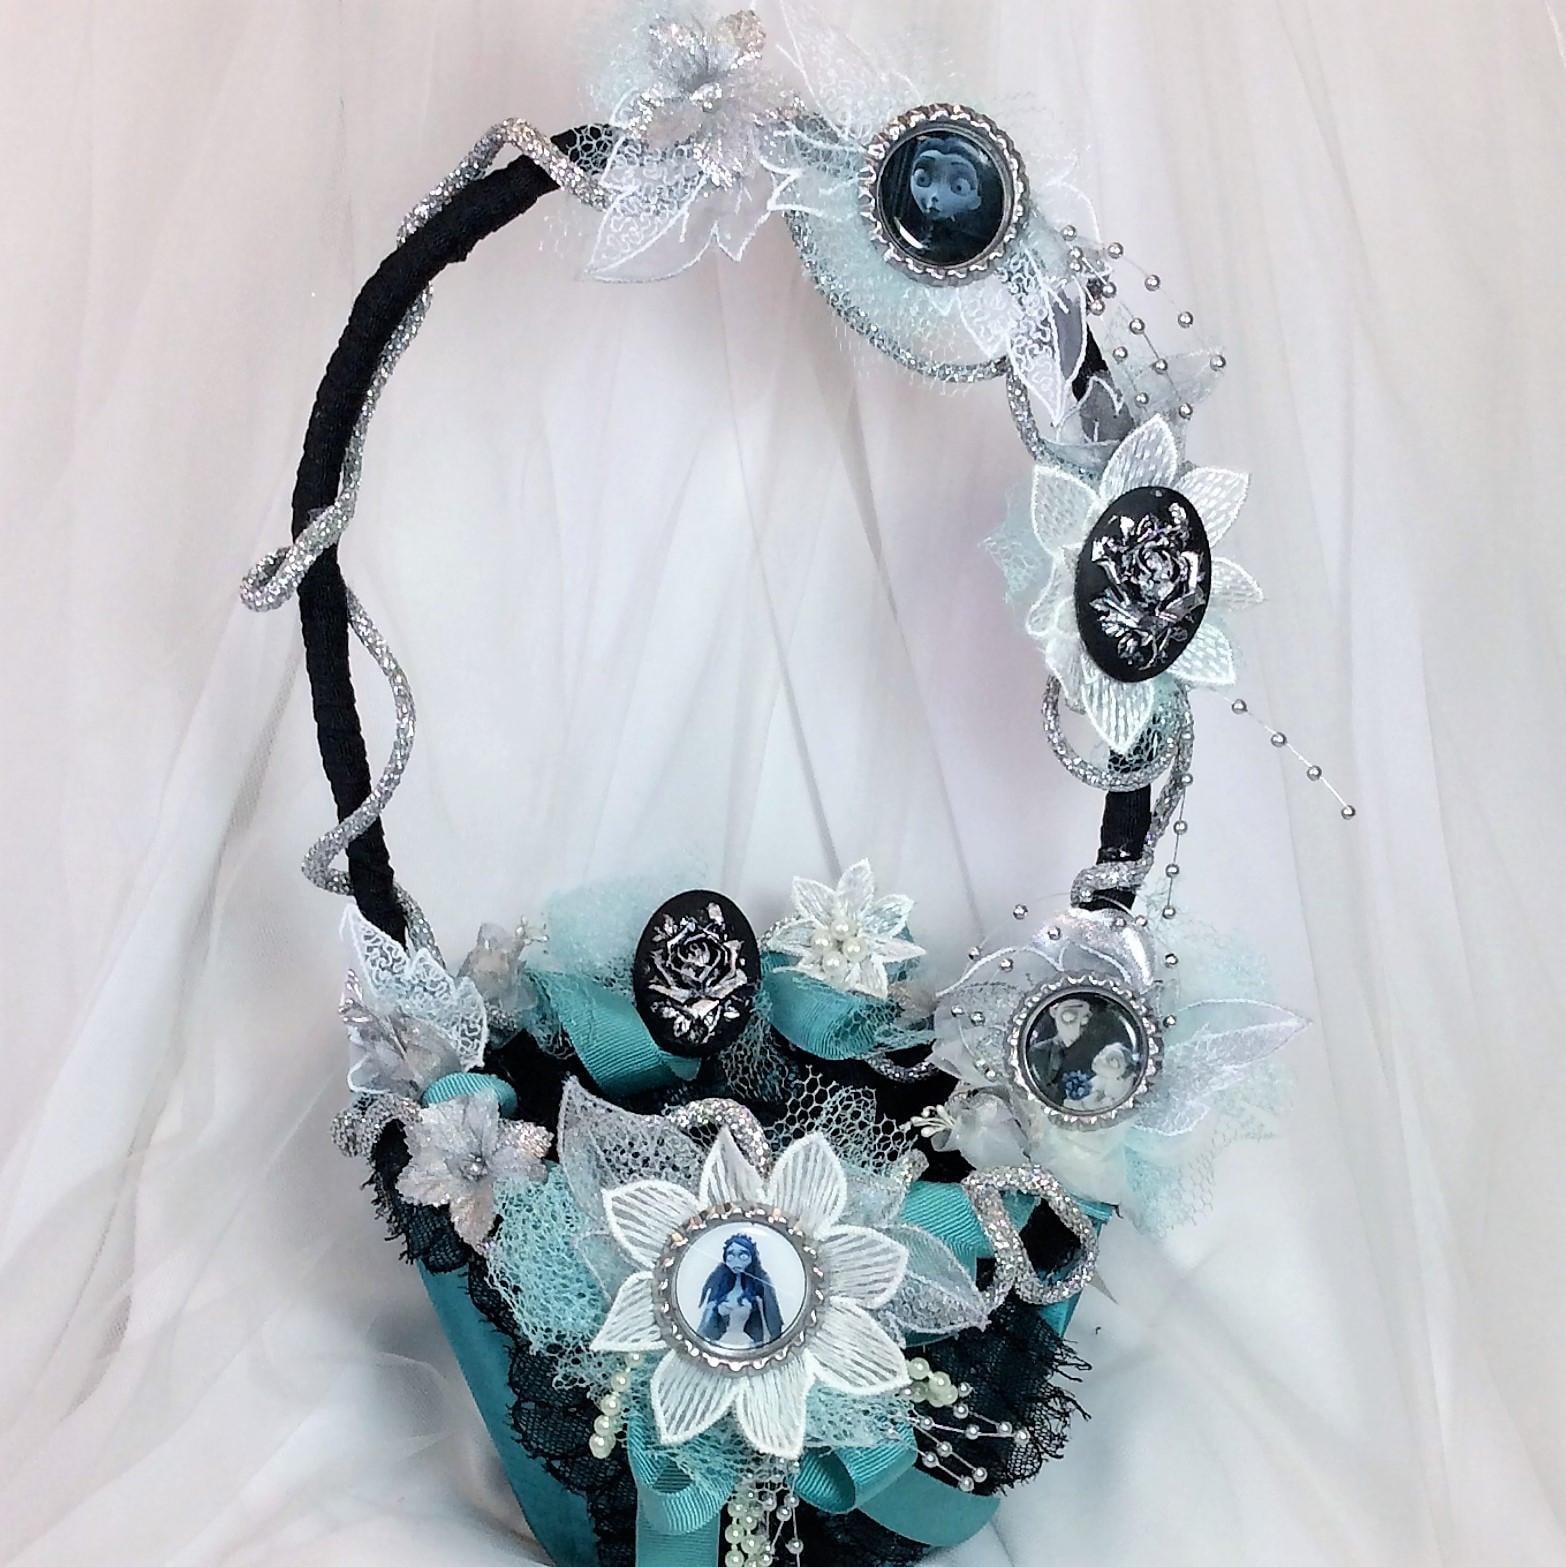 Luxury Corpse Bride Wedding Cake Images - The Wedding Ideas ...